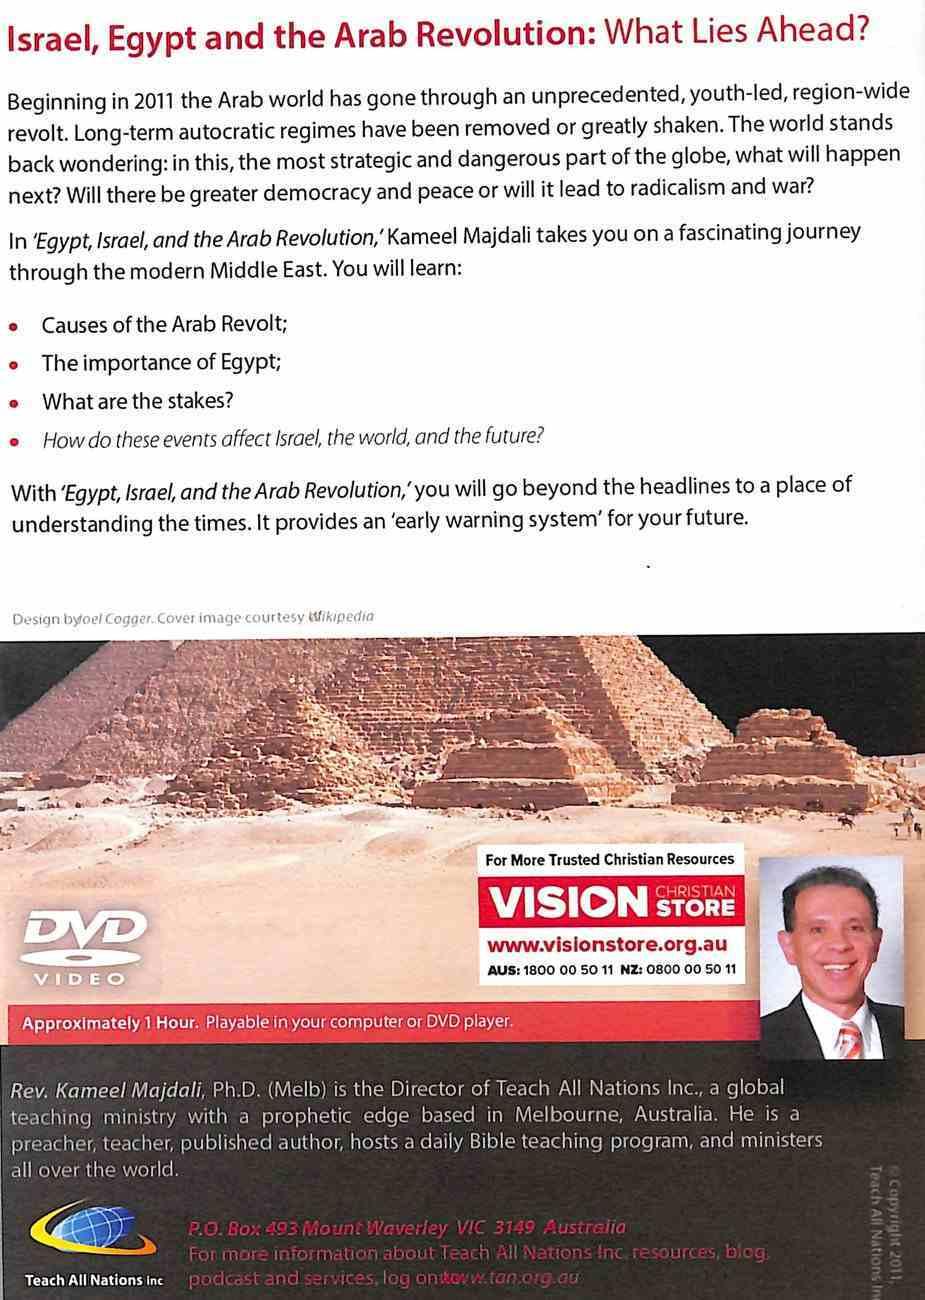 Israel, Egypt and the Arab Revolution DVD